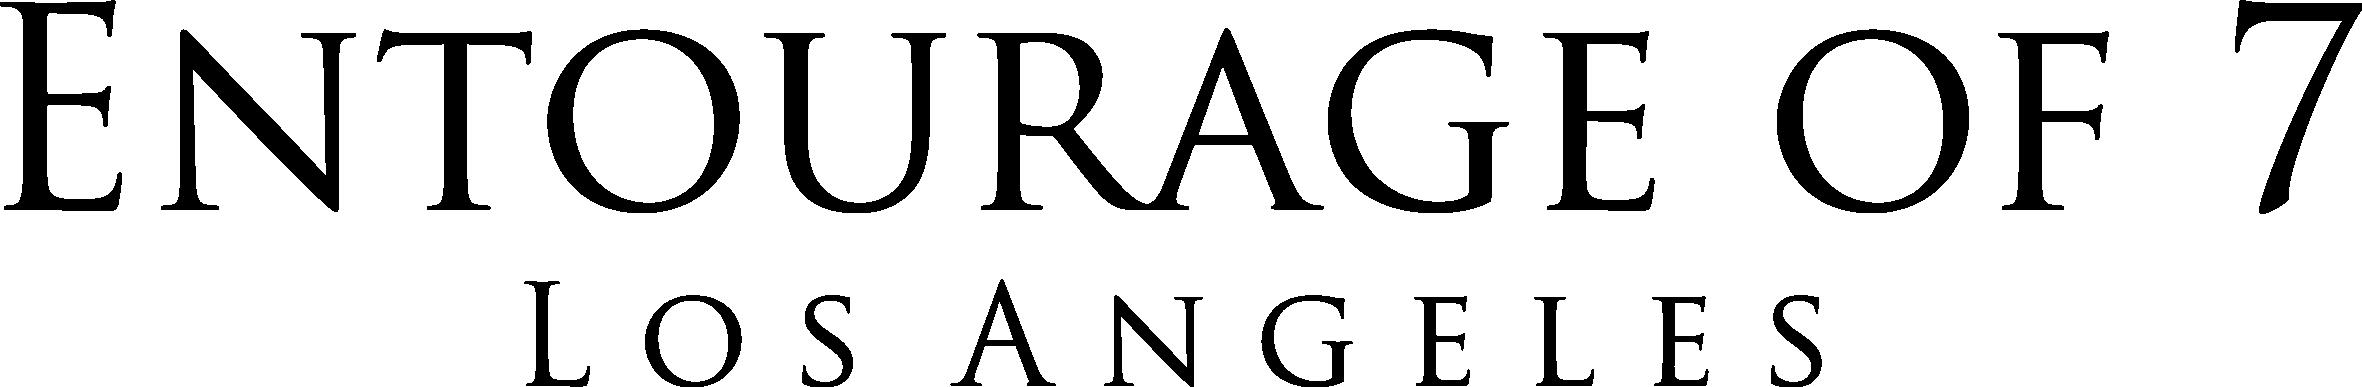 Entourageof7_logo_black.png